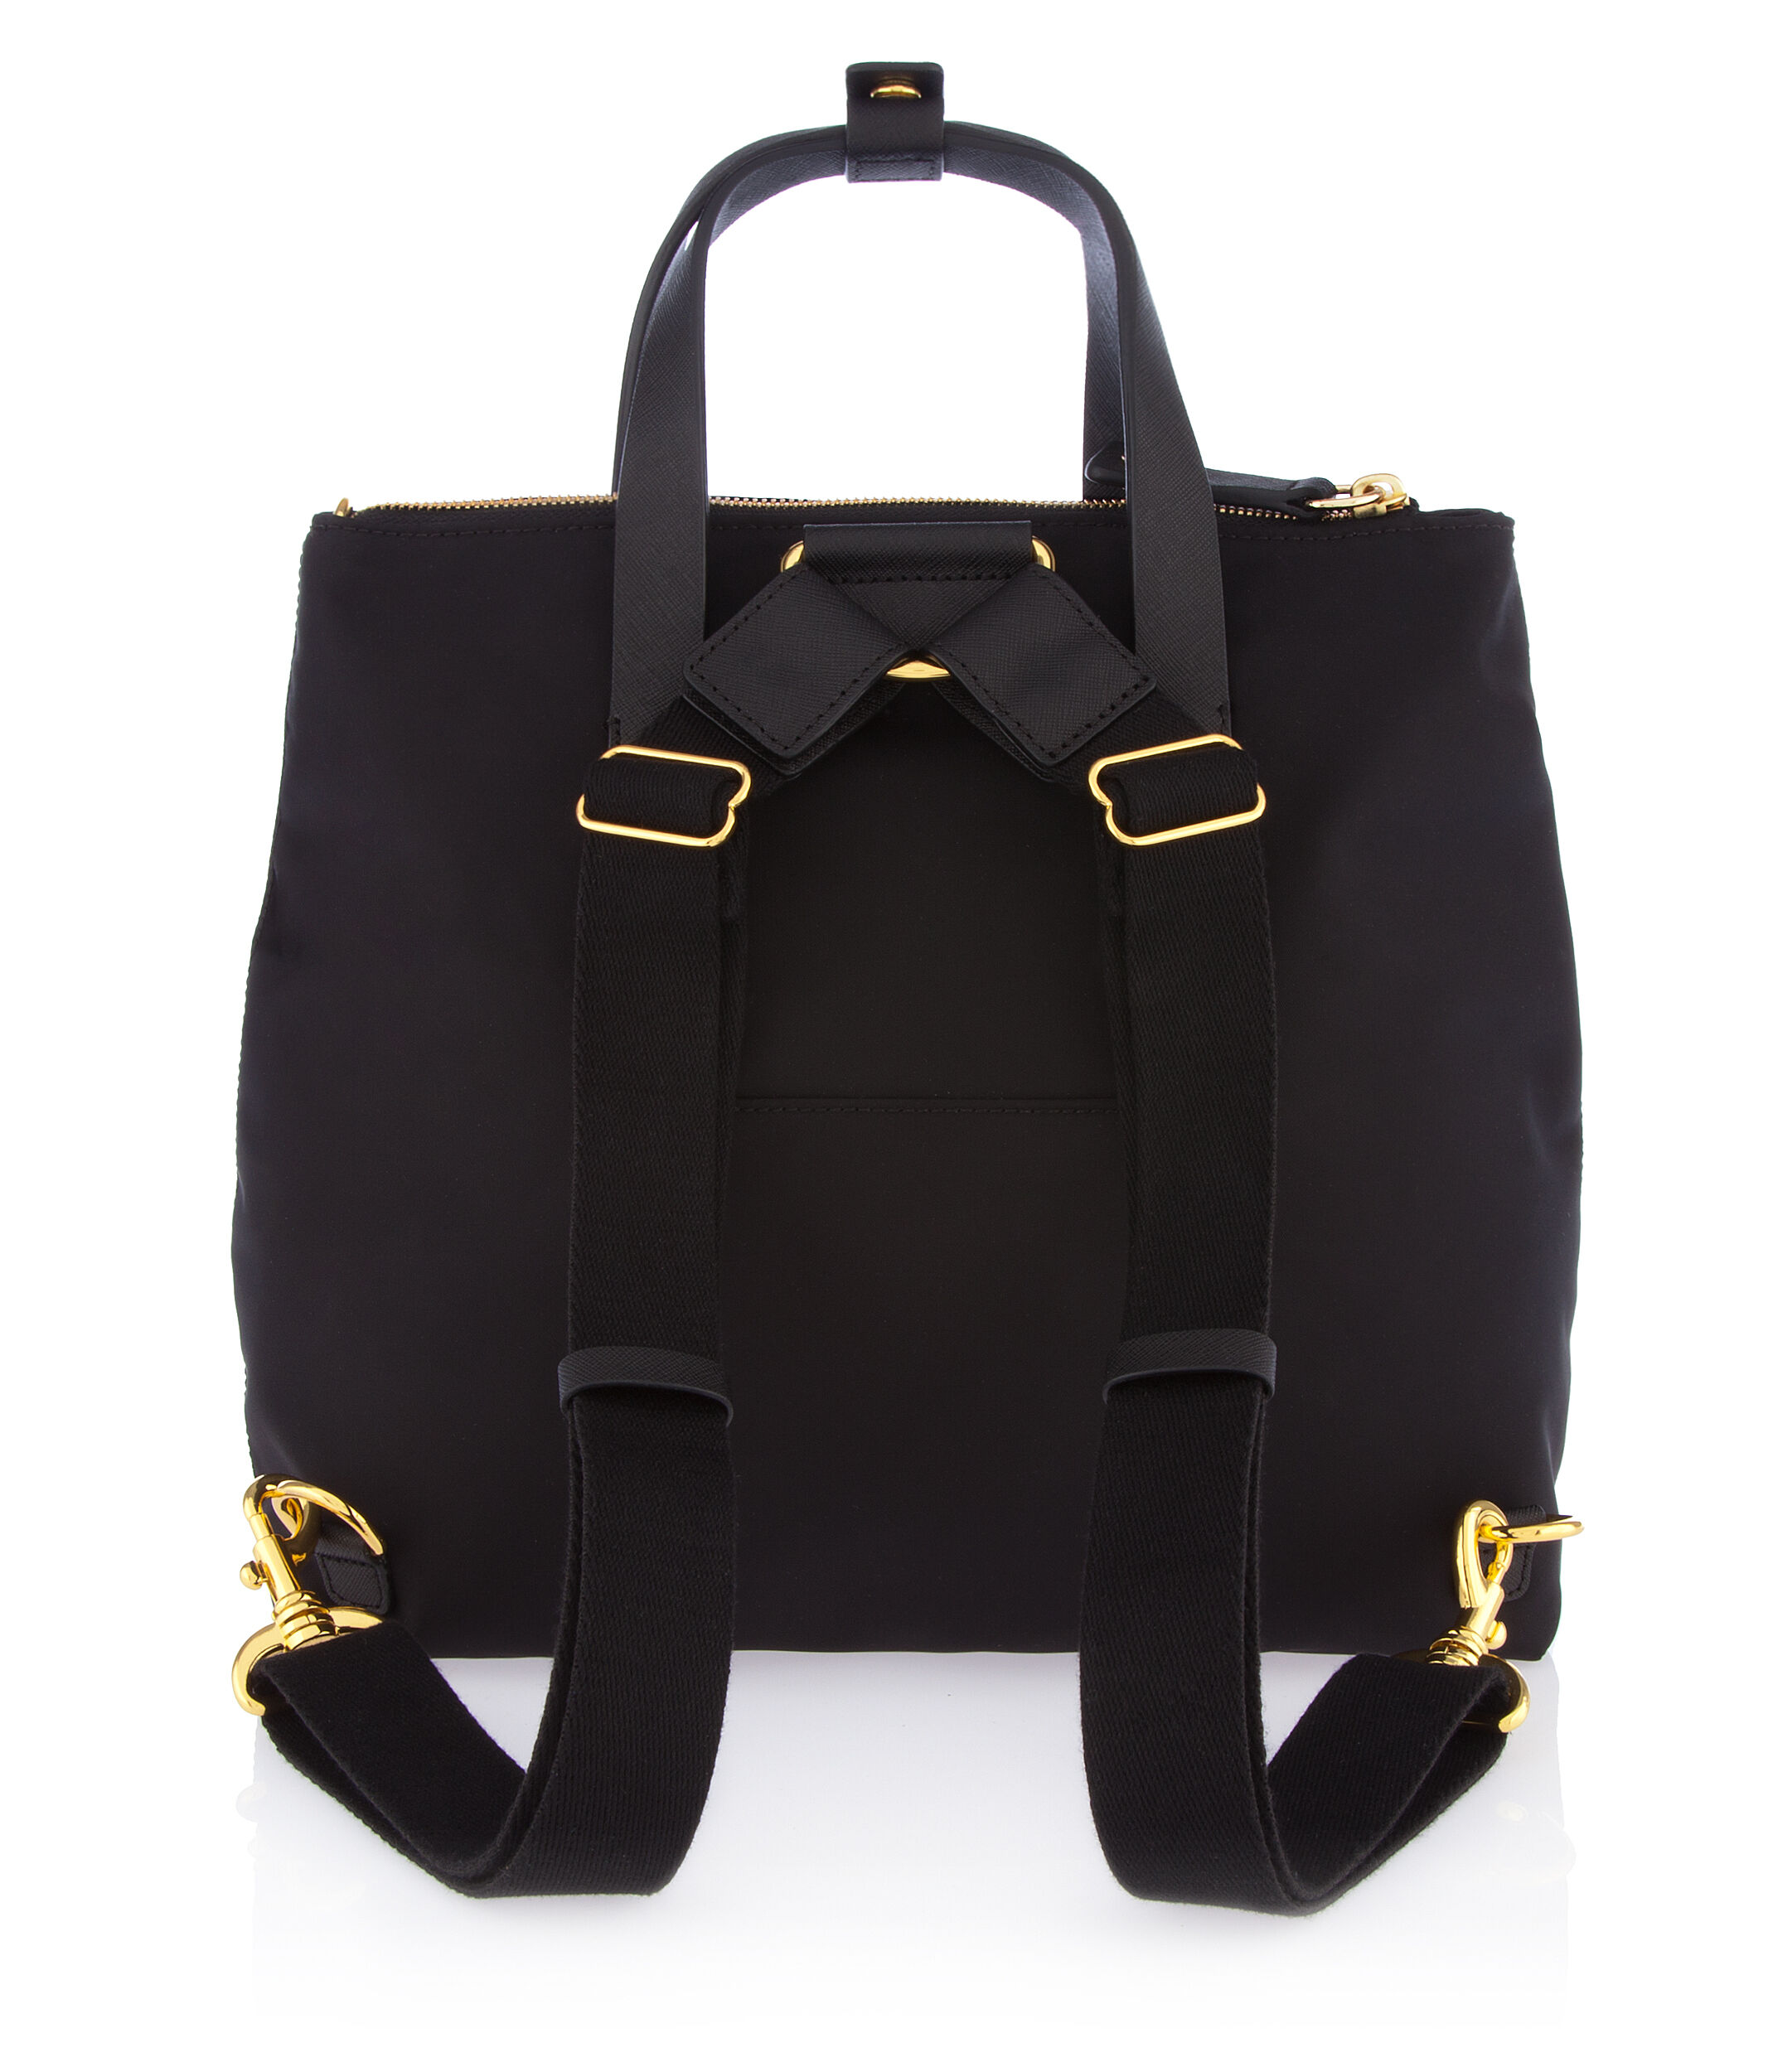 Backpack Purse Convertible 3SpYDzhJ